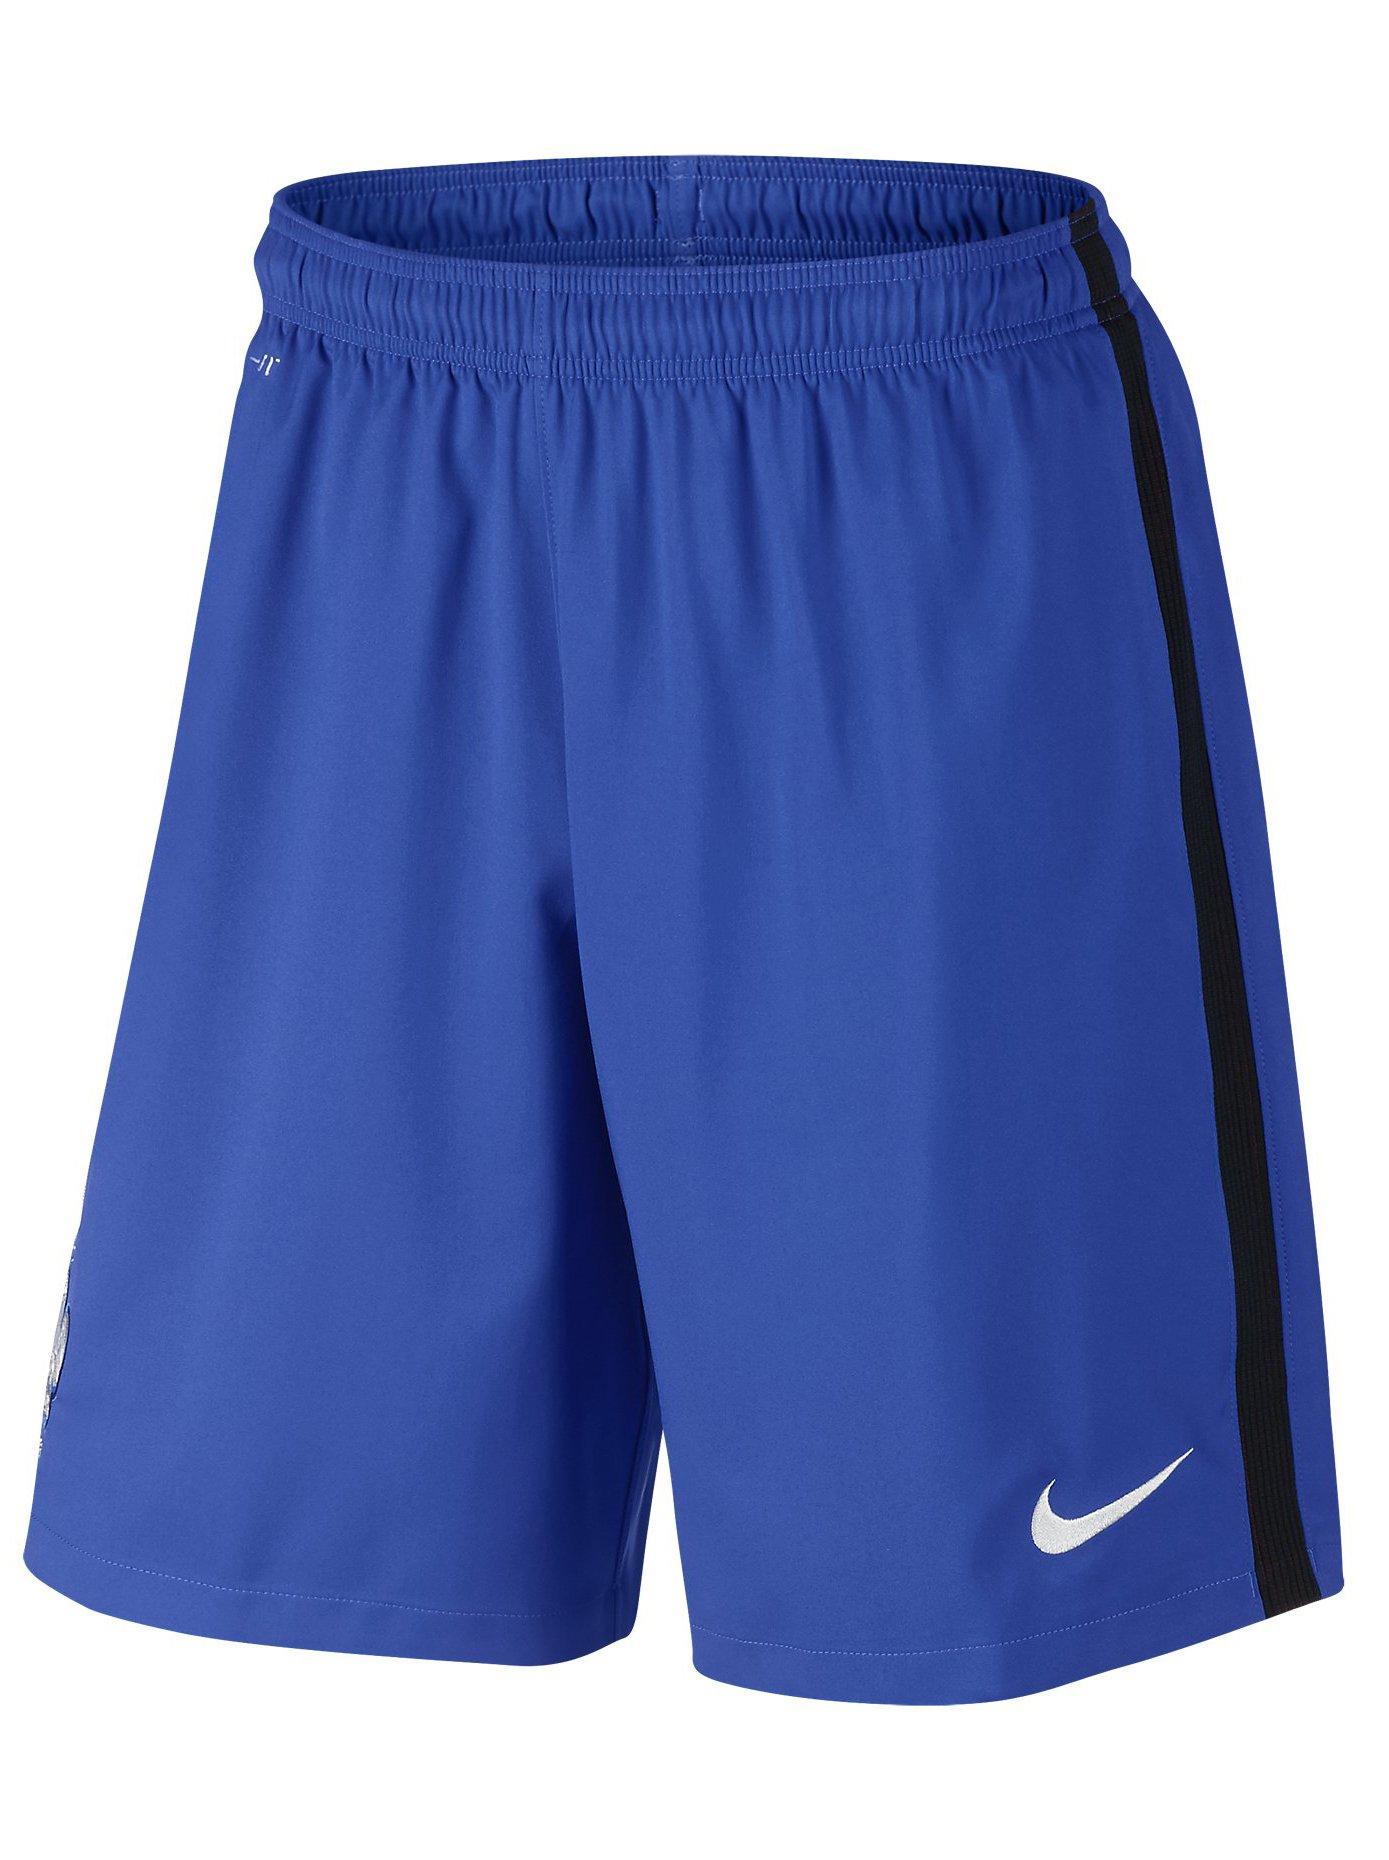 Šortky Nike FFF M H/A STADIUM SHORT